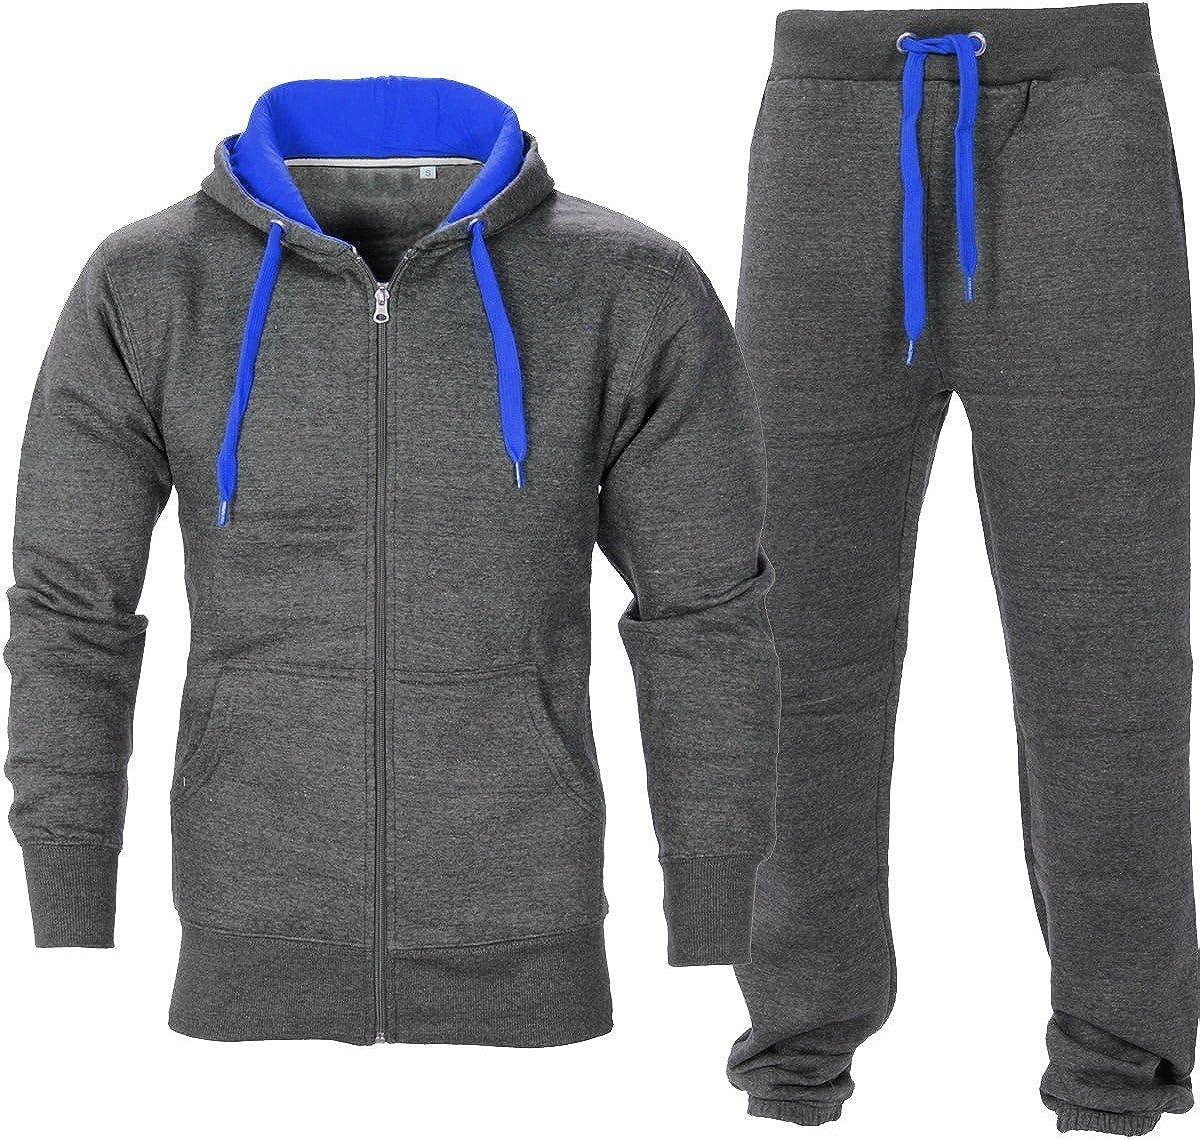 Missmister – Contraste Jogging Chándal Regular Cord Squad Fleece ...